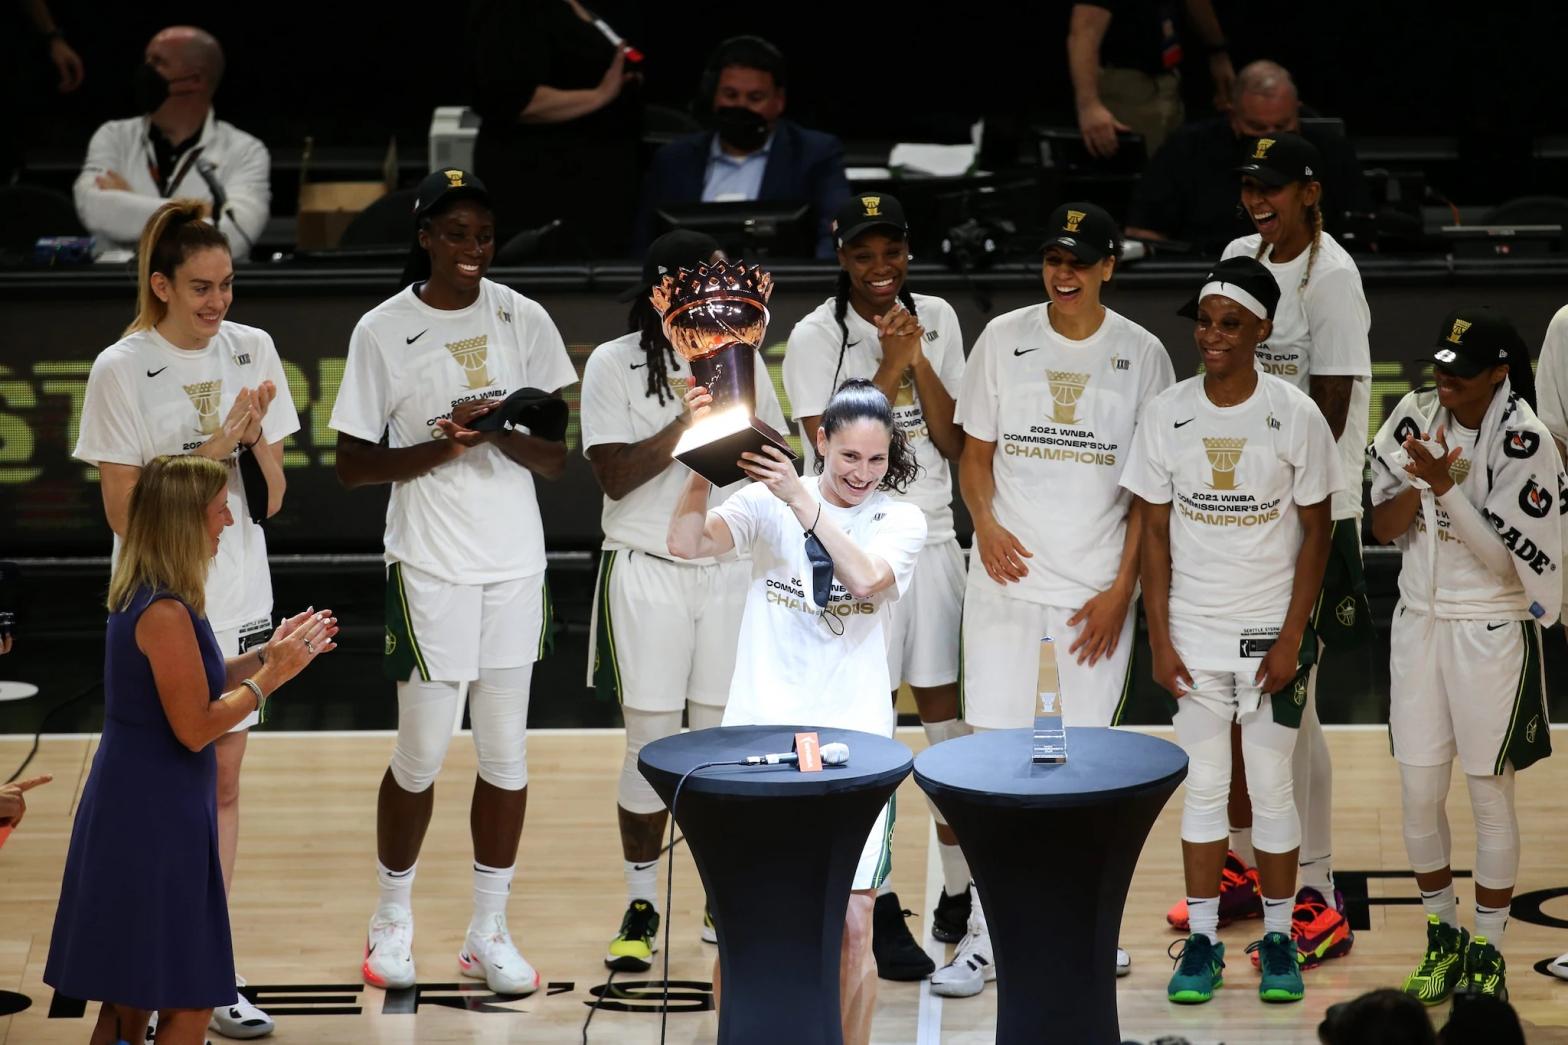 WNBA: Seattle Storm vence en la fina de la Copa del Comisionado